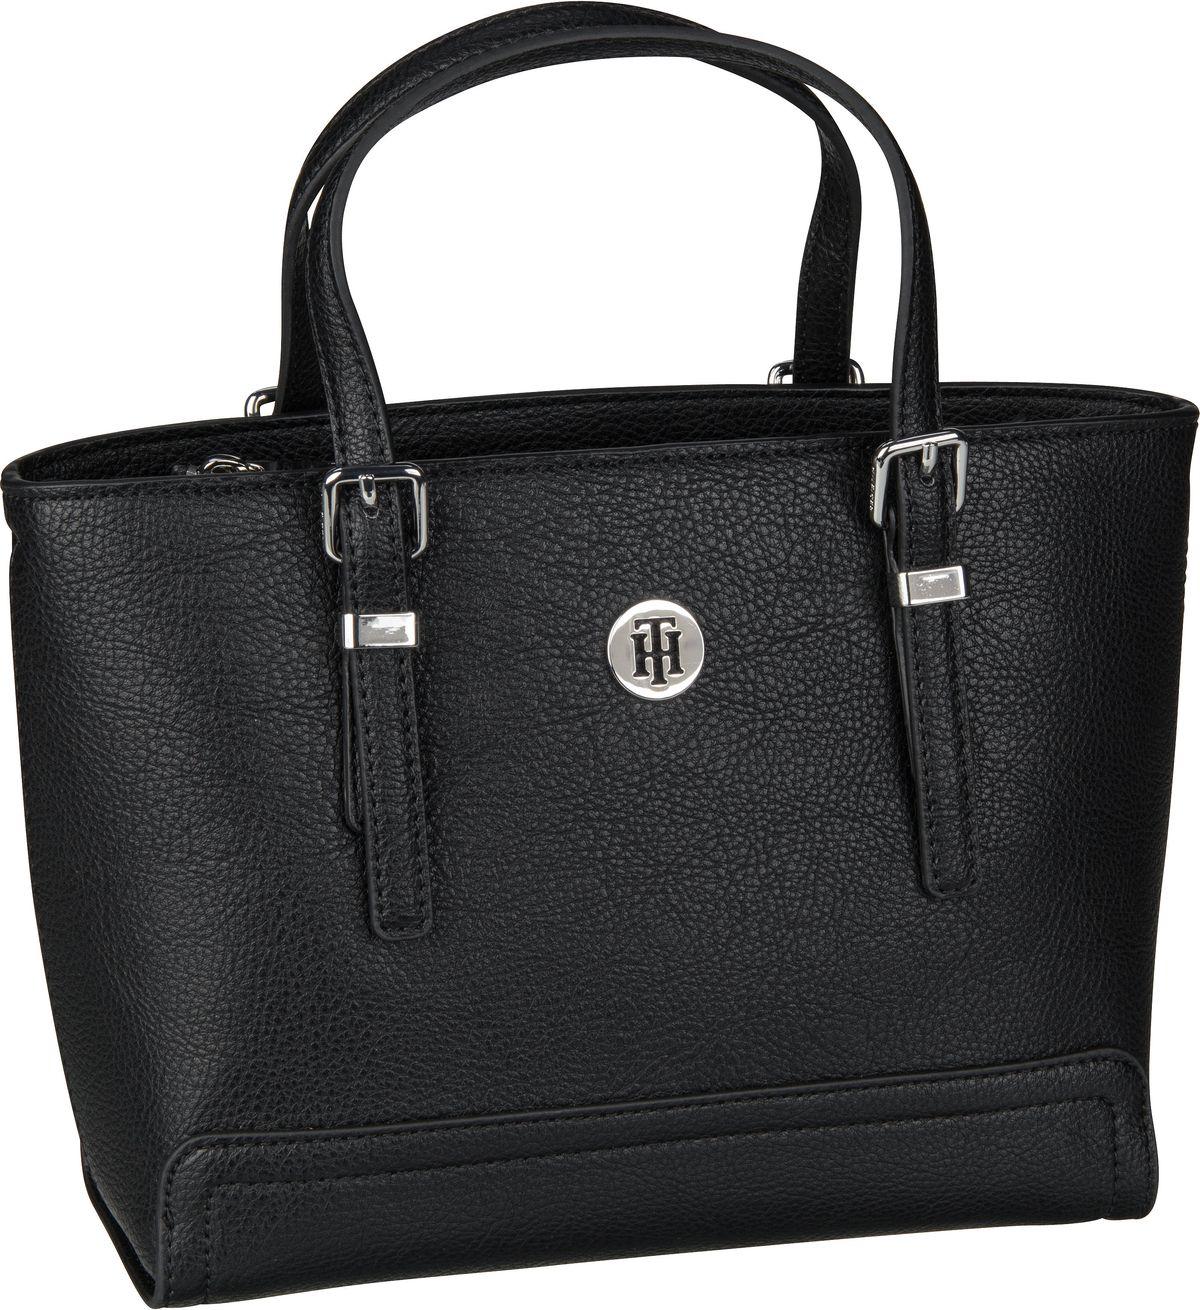 Handtasche Honey Small Tote 7297 Black